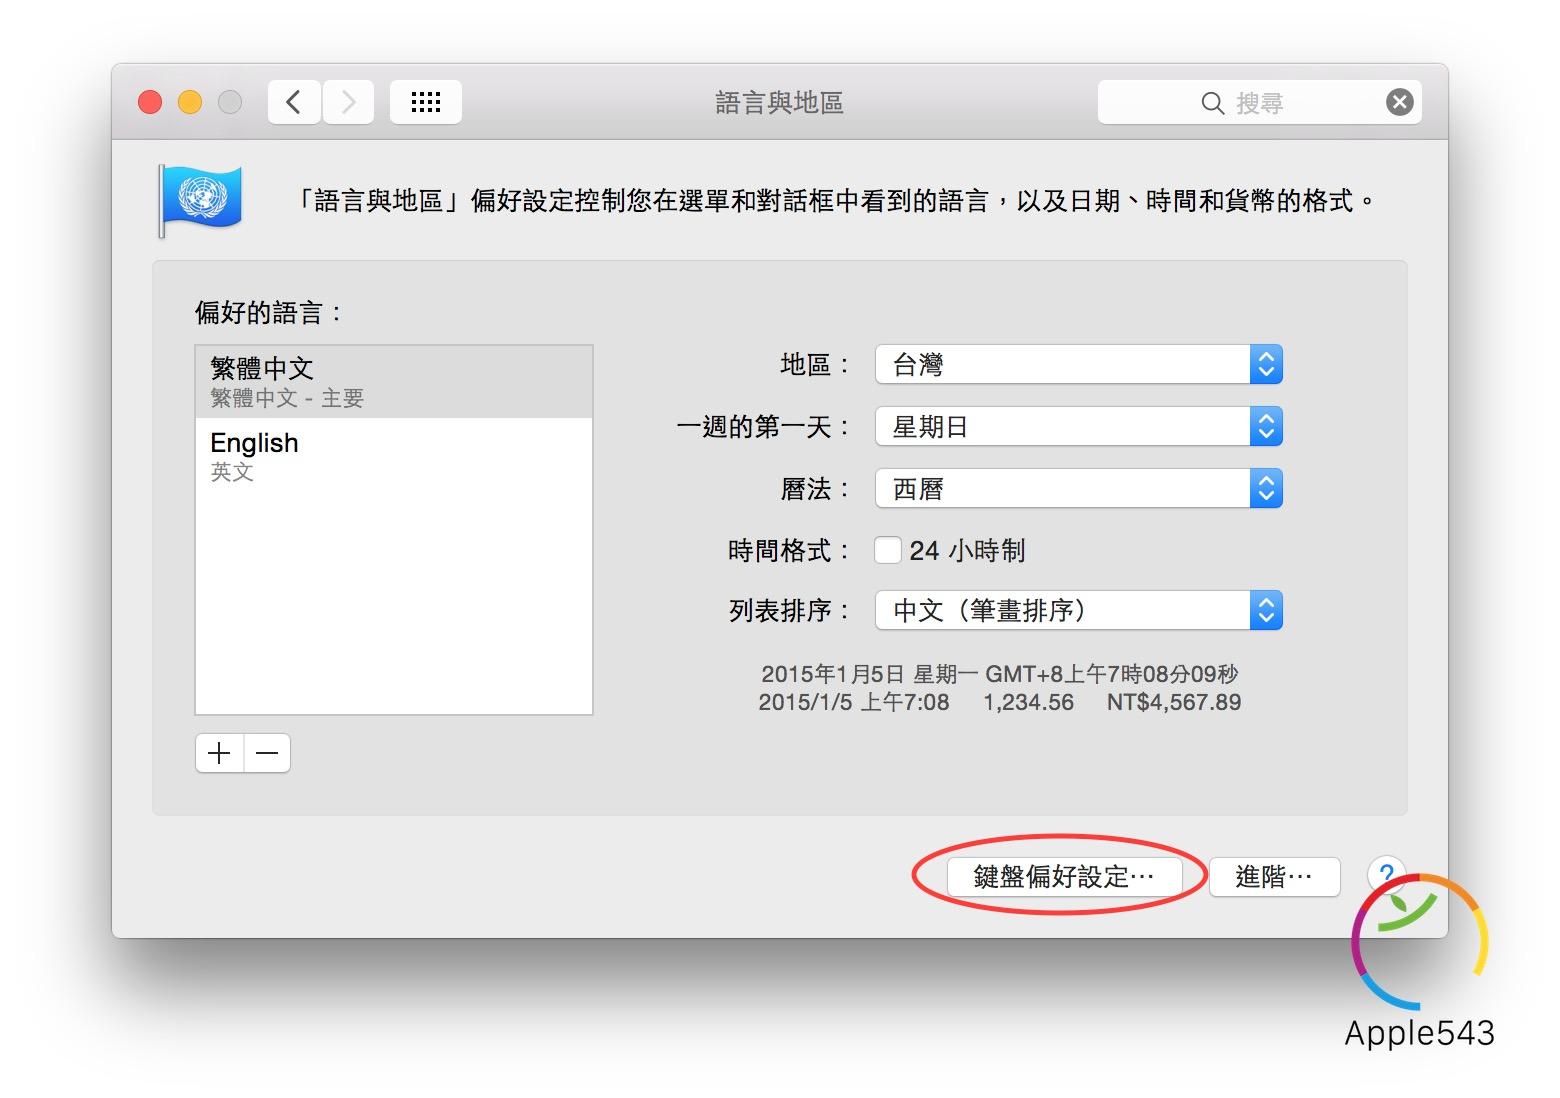 Mac 新增輸入法 超容易,誰還在跟你下載櫻花輸入法! - Apple543 找教學